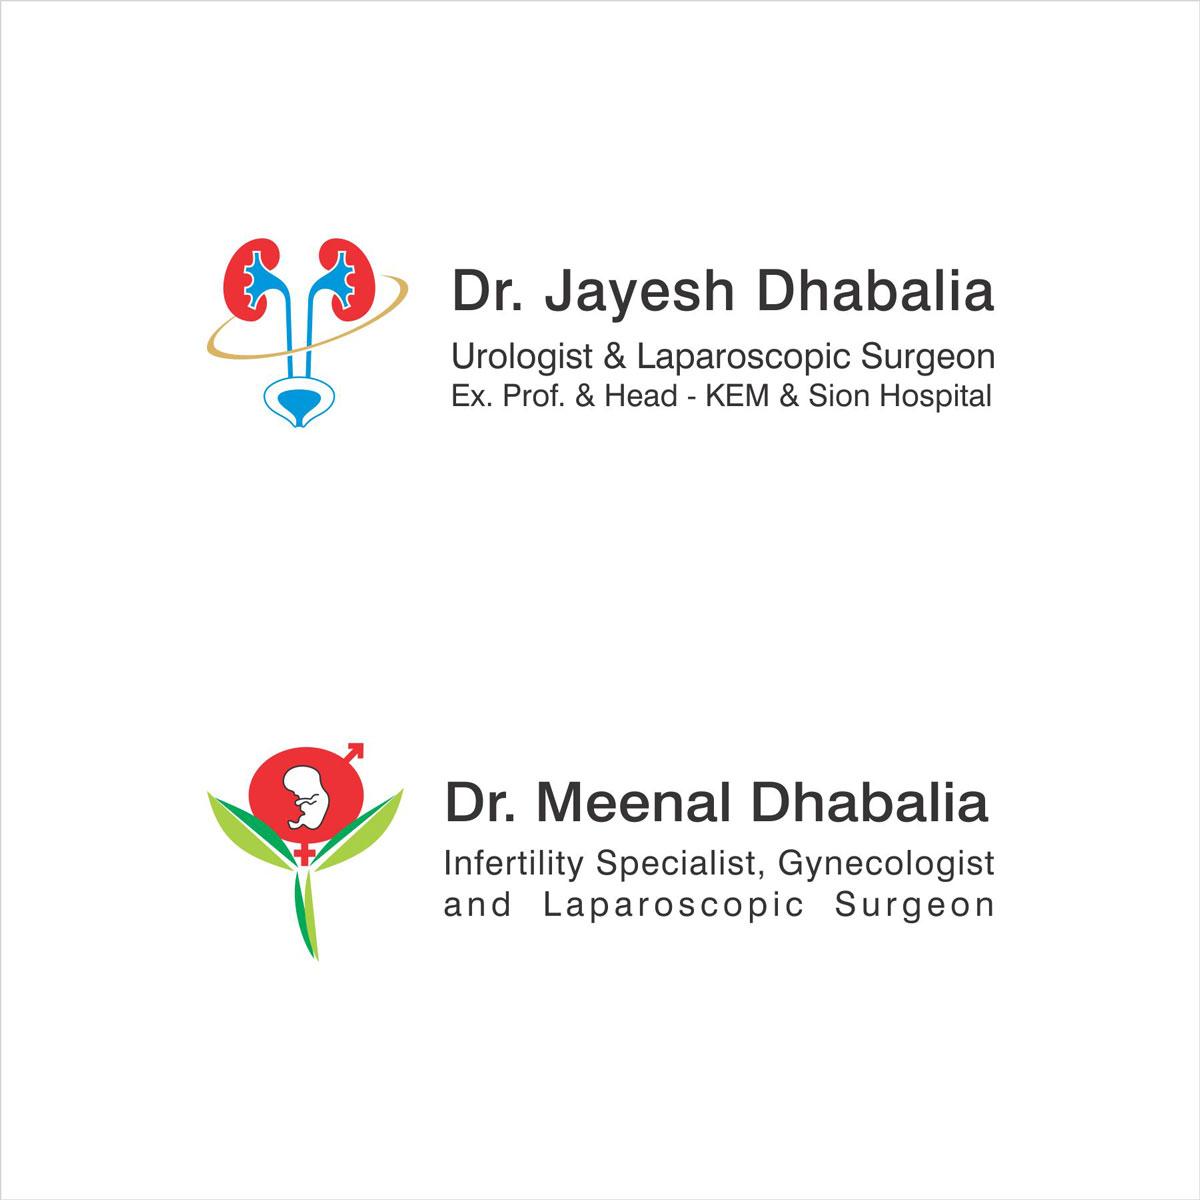 logo design for hospital and medical center